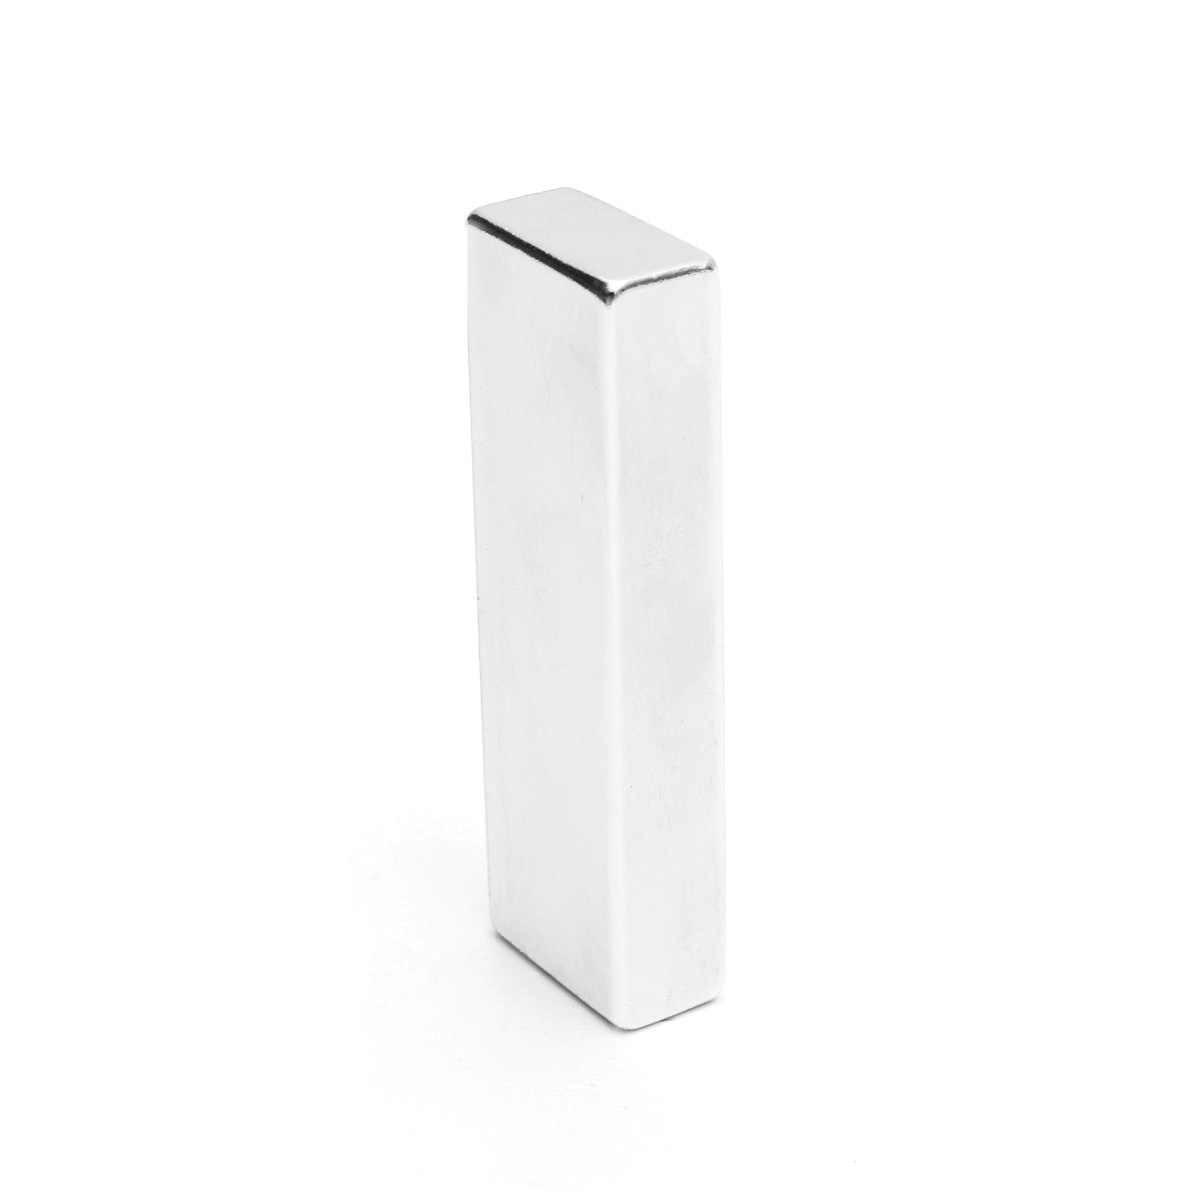 1 pc N52 ブロックマグネット立方体希土類ネオジム磁石 60 ミリメートル × 20 ミリメートル × 10 ミリメートルマグネット最低価格